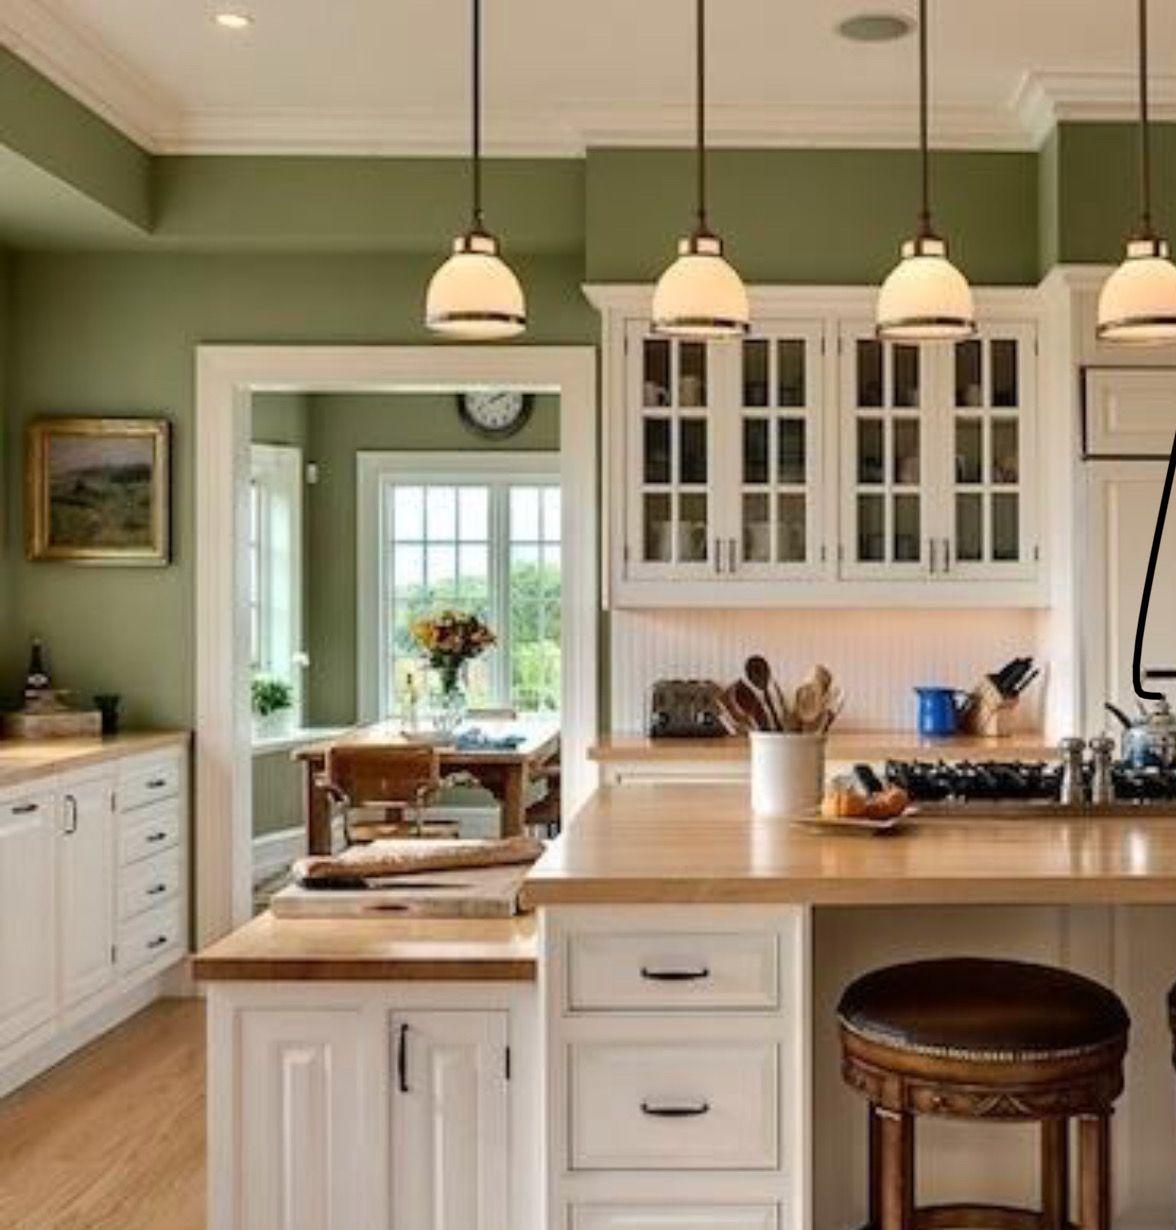 Moss green kitchen Green kitchen walls, Paint for